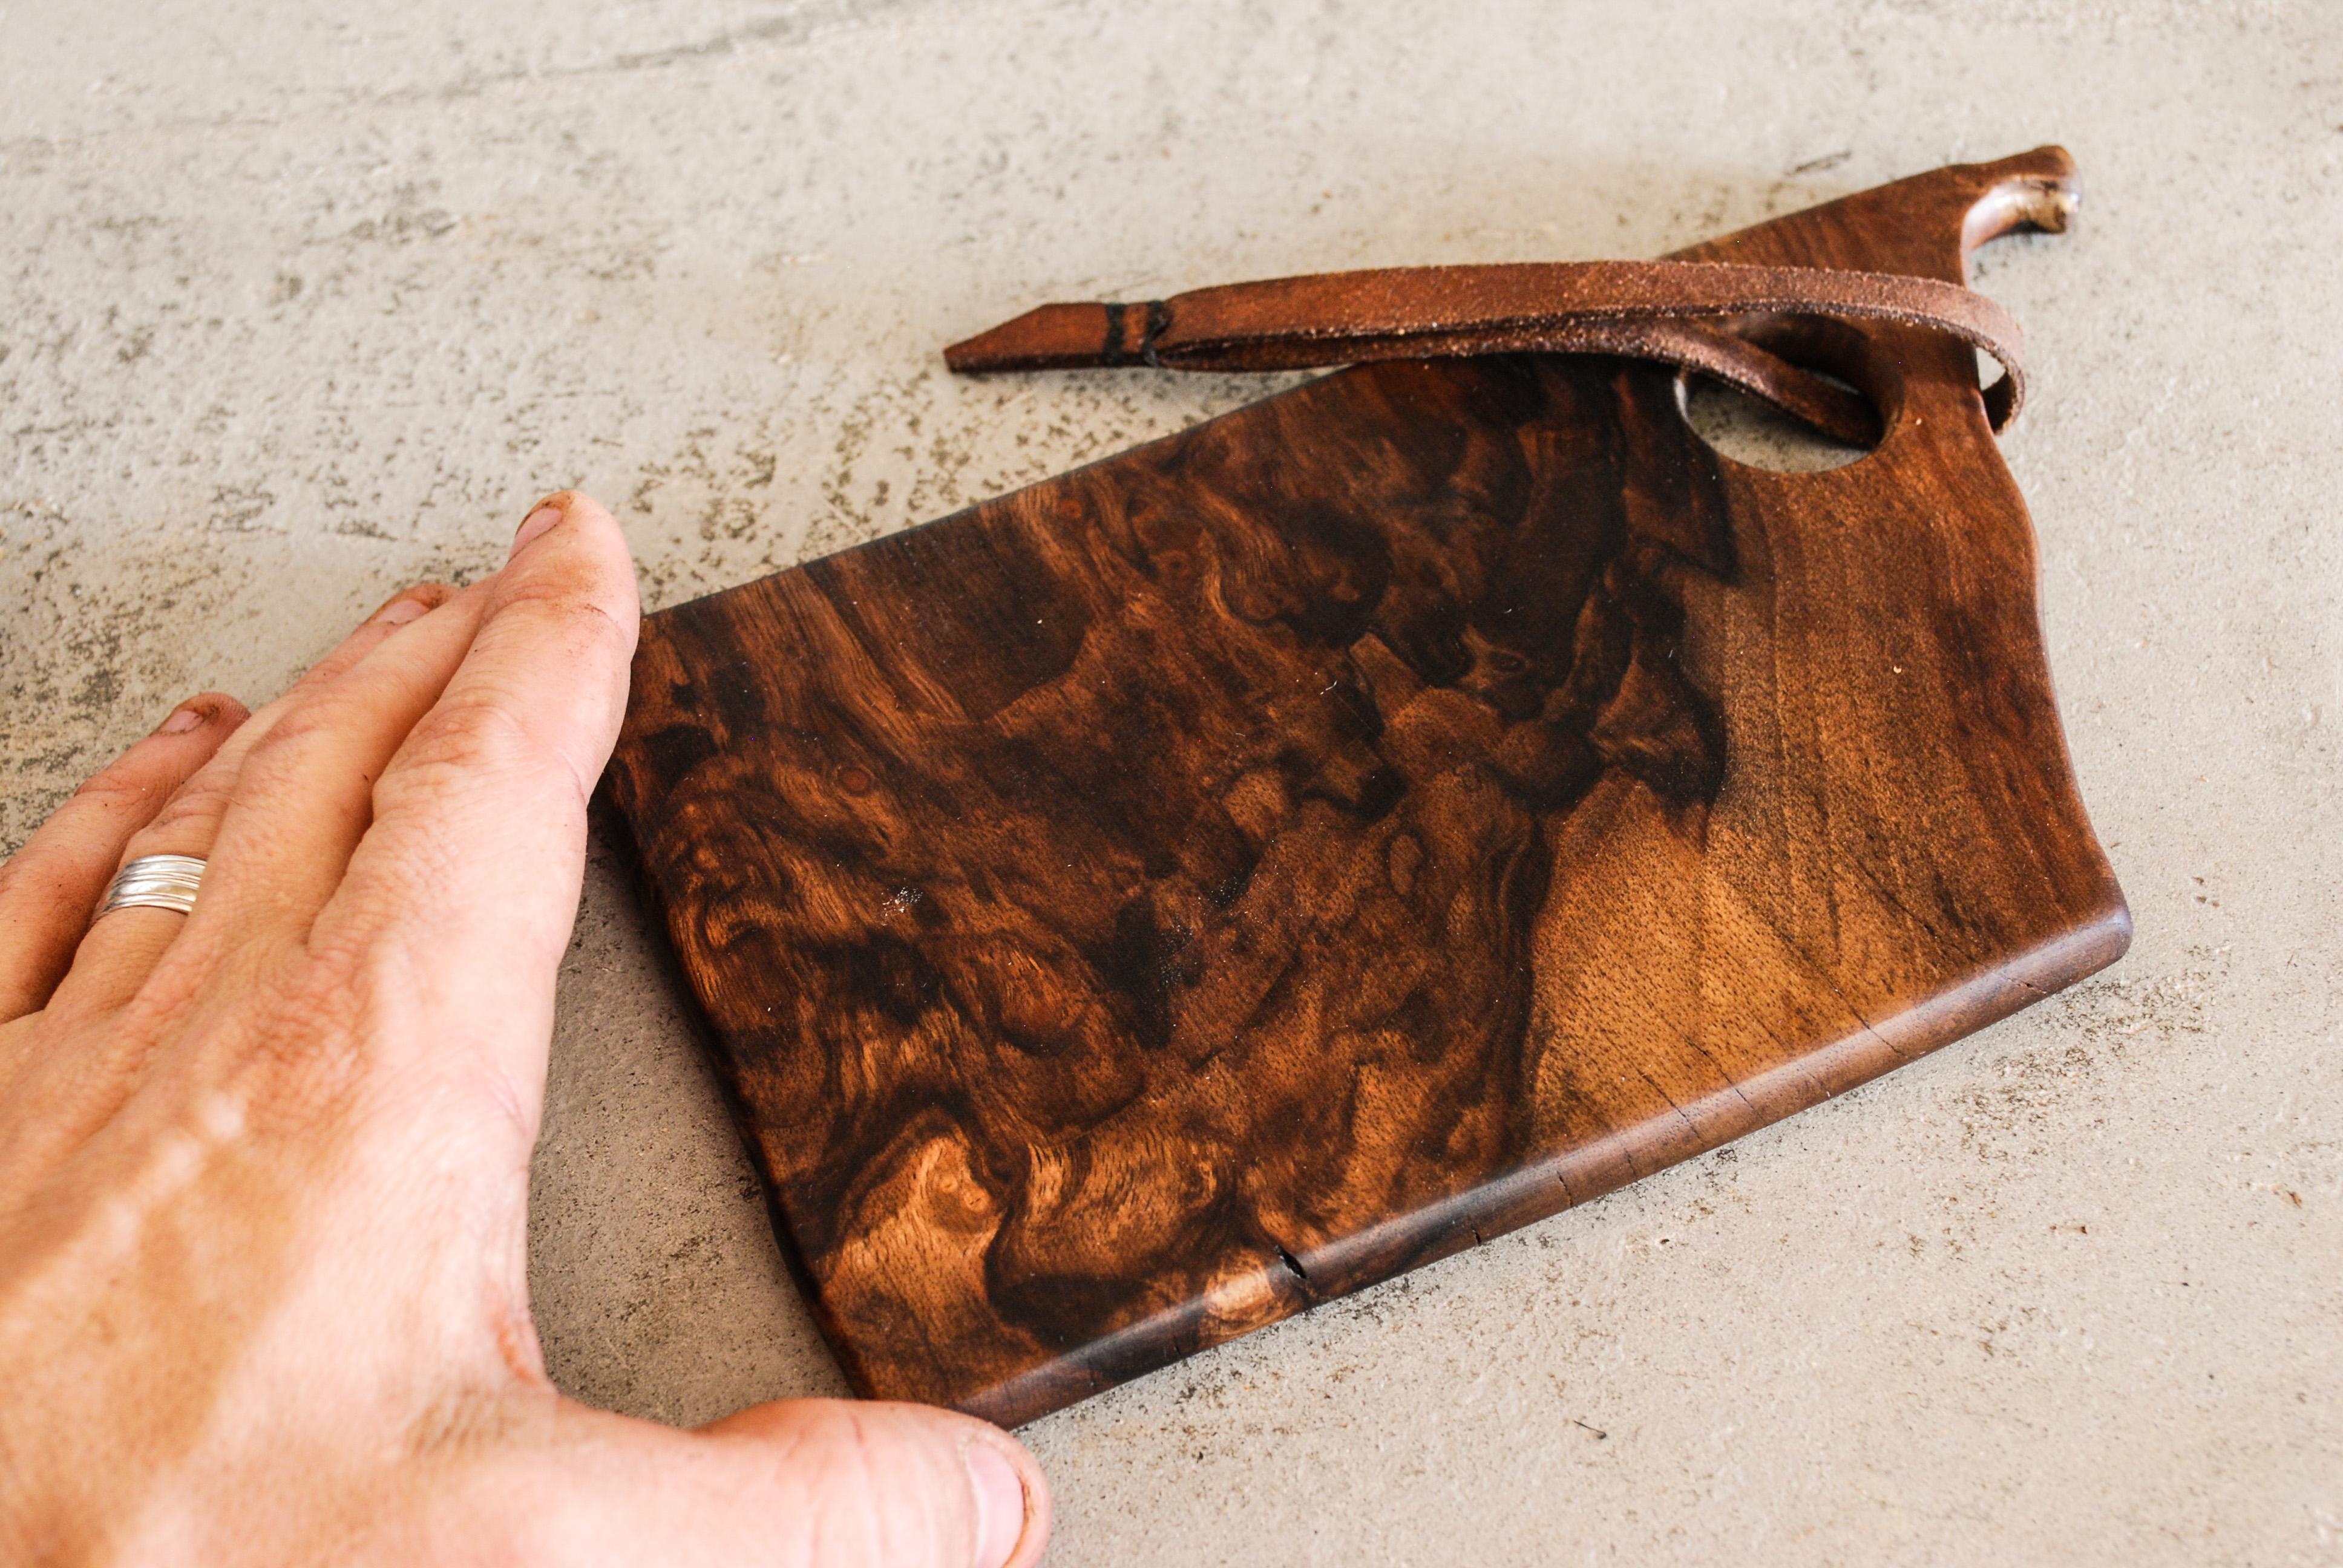 Small Walnut cutting board  - how to make one